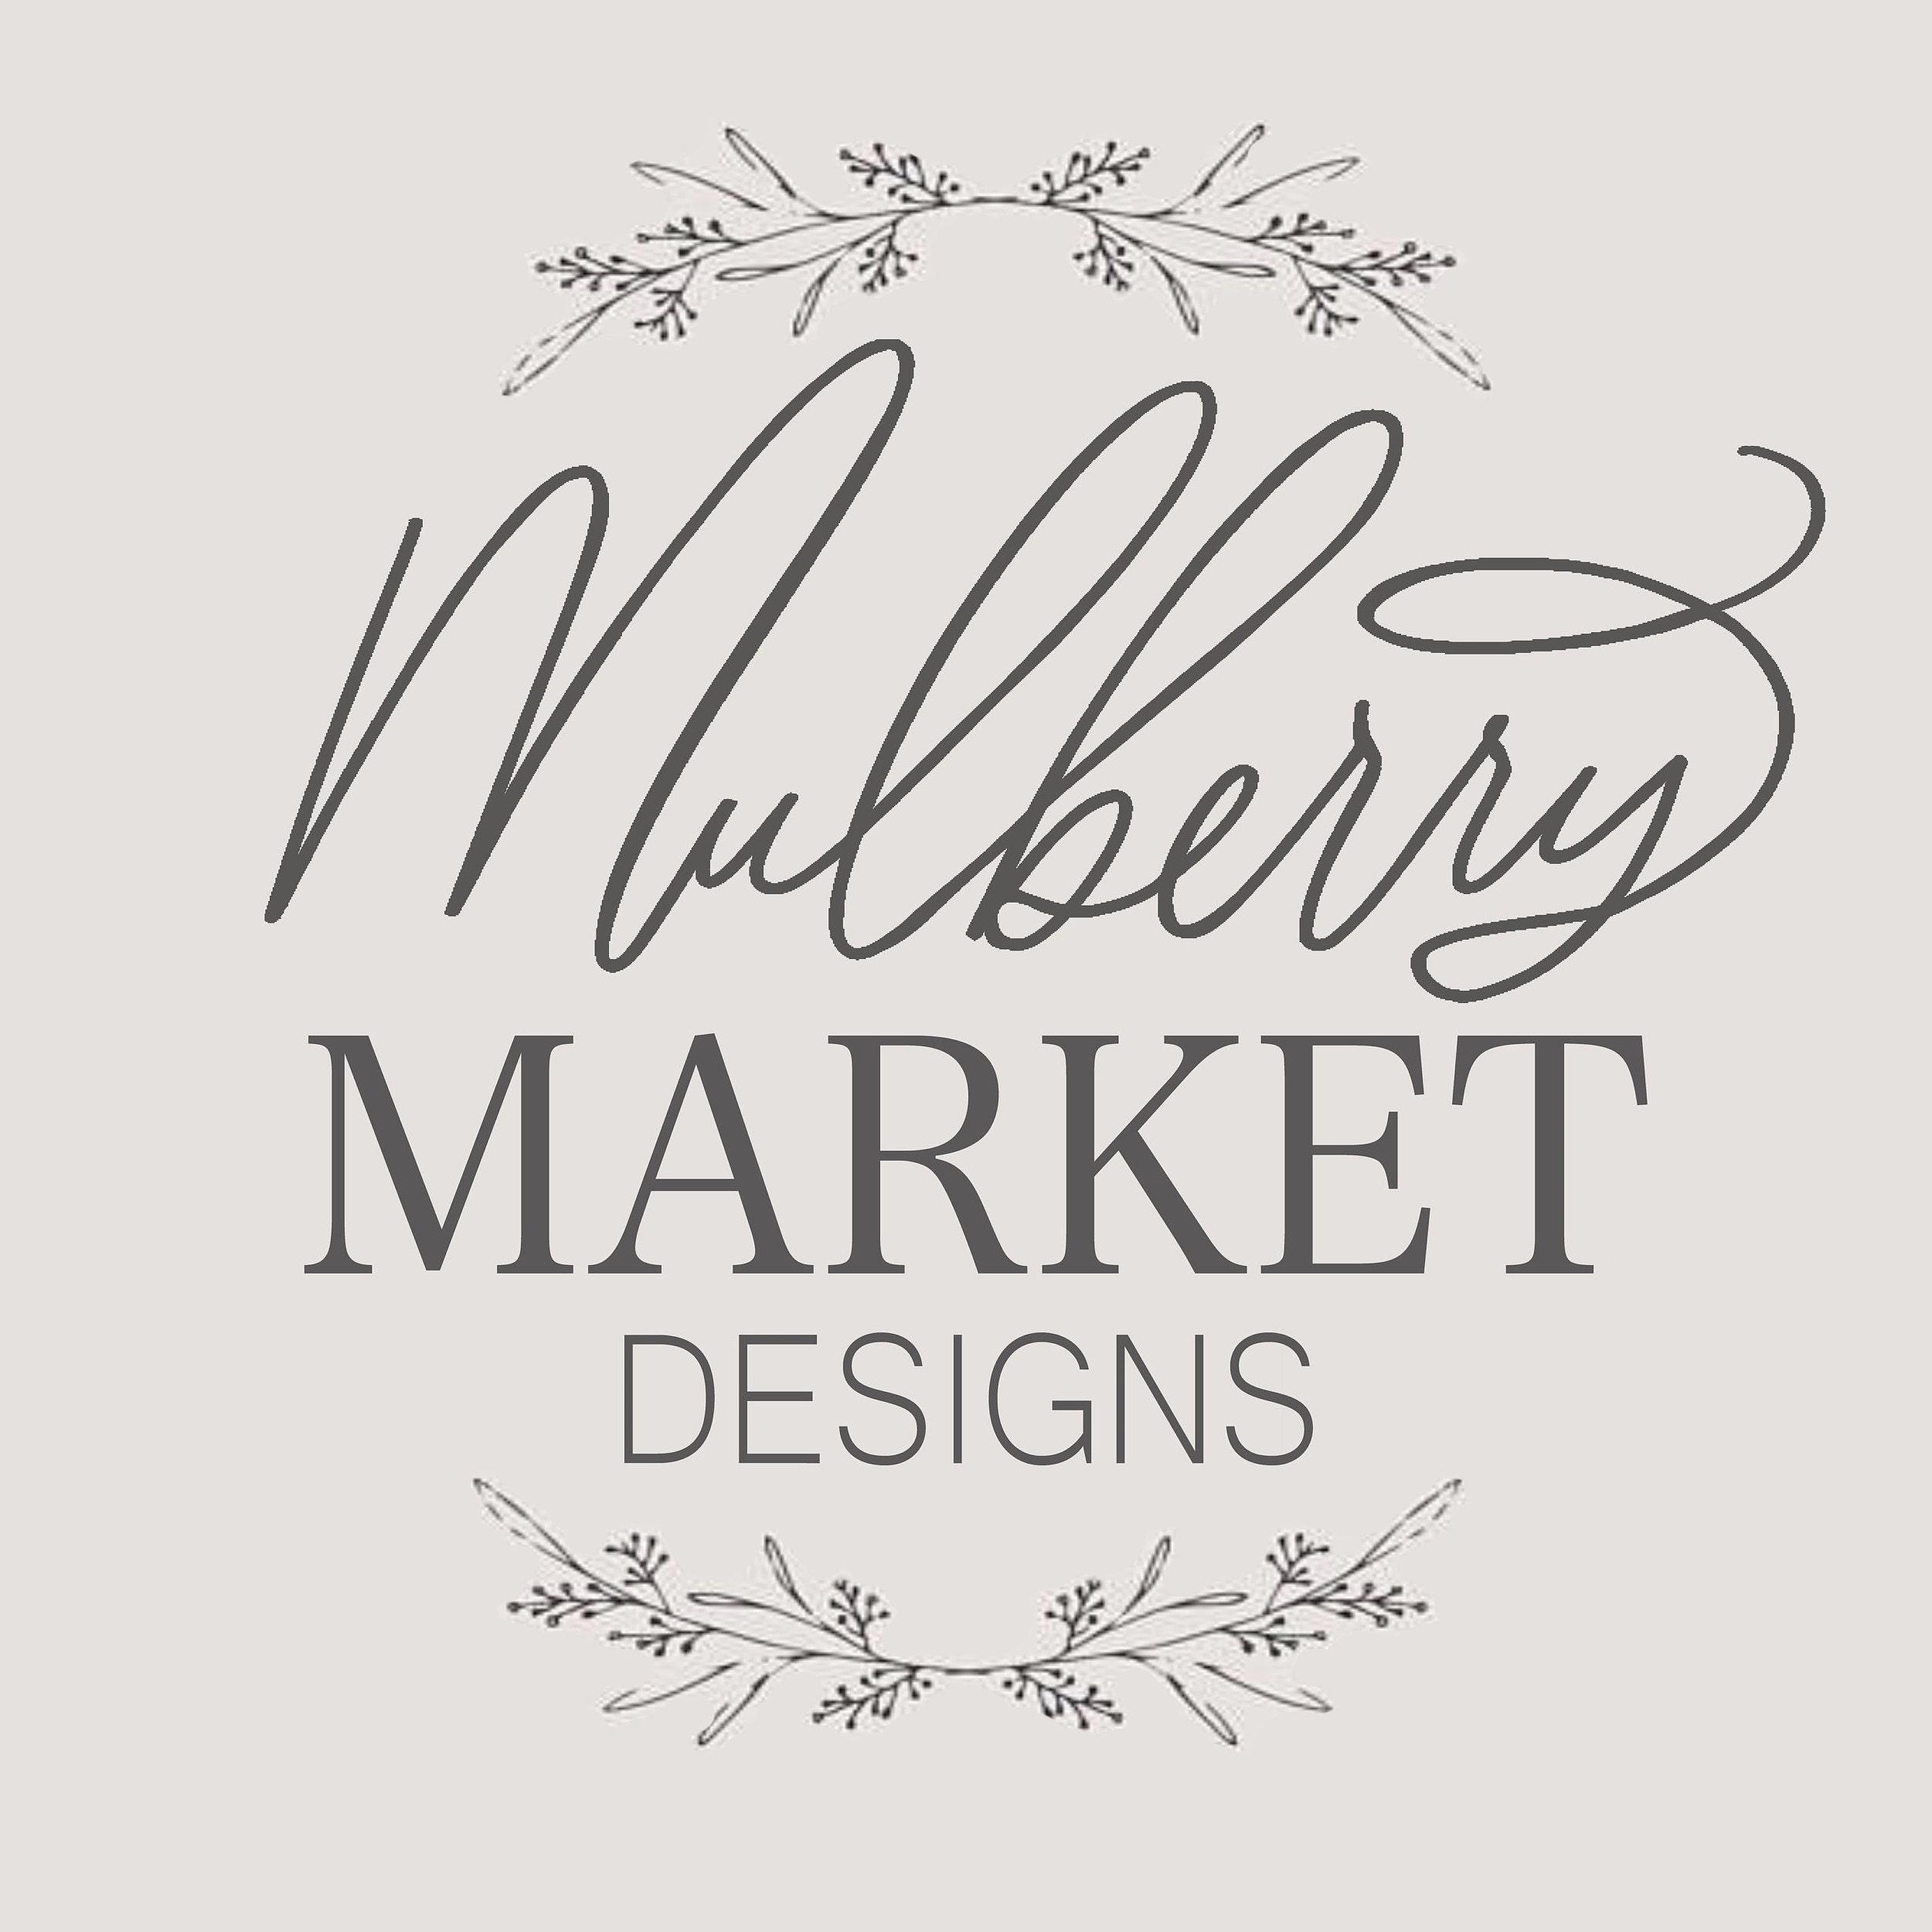 Original Hand Painted Wedding Signs   Home by MulberryMarketDesign 32df09442dfe